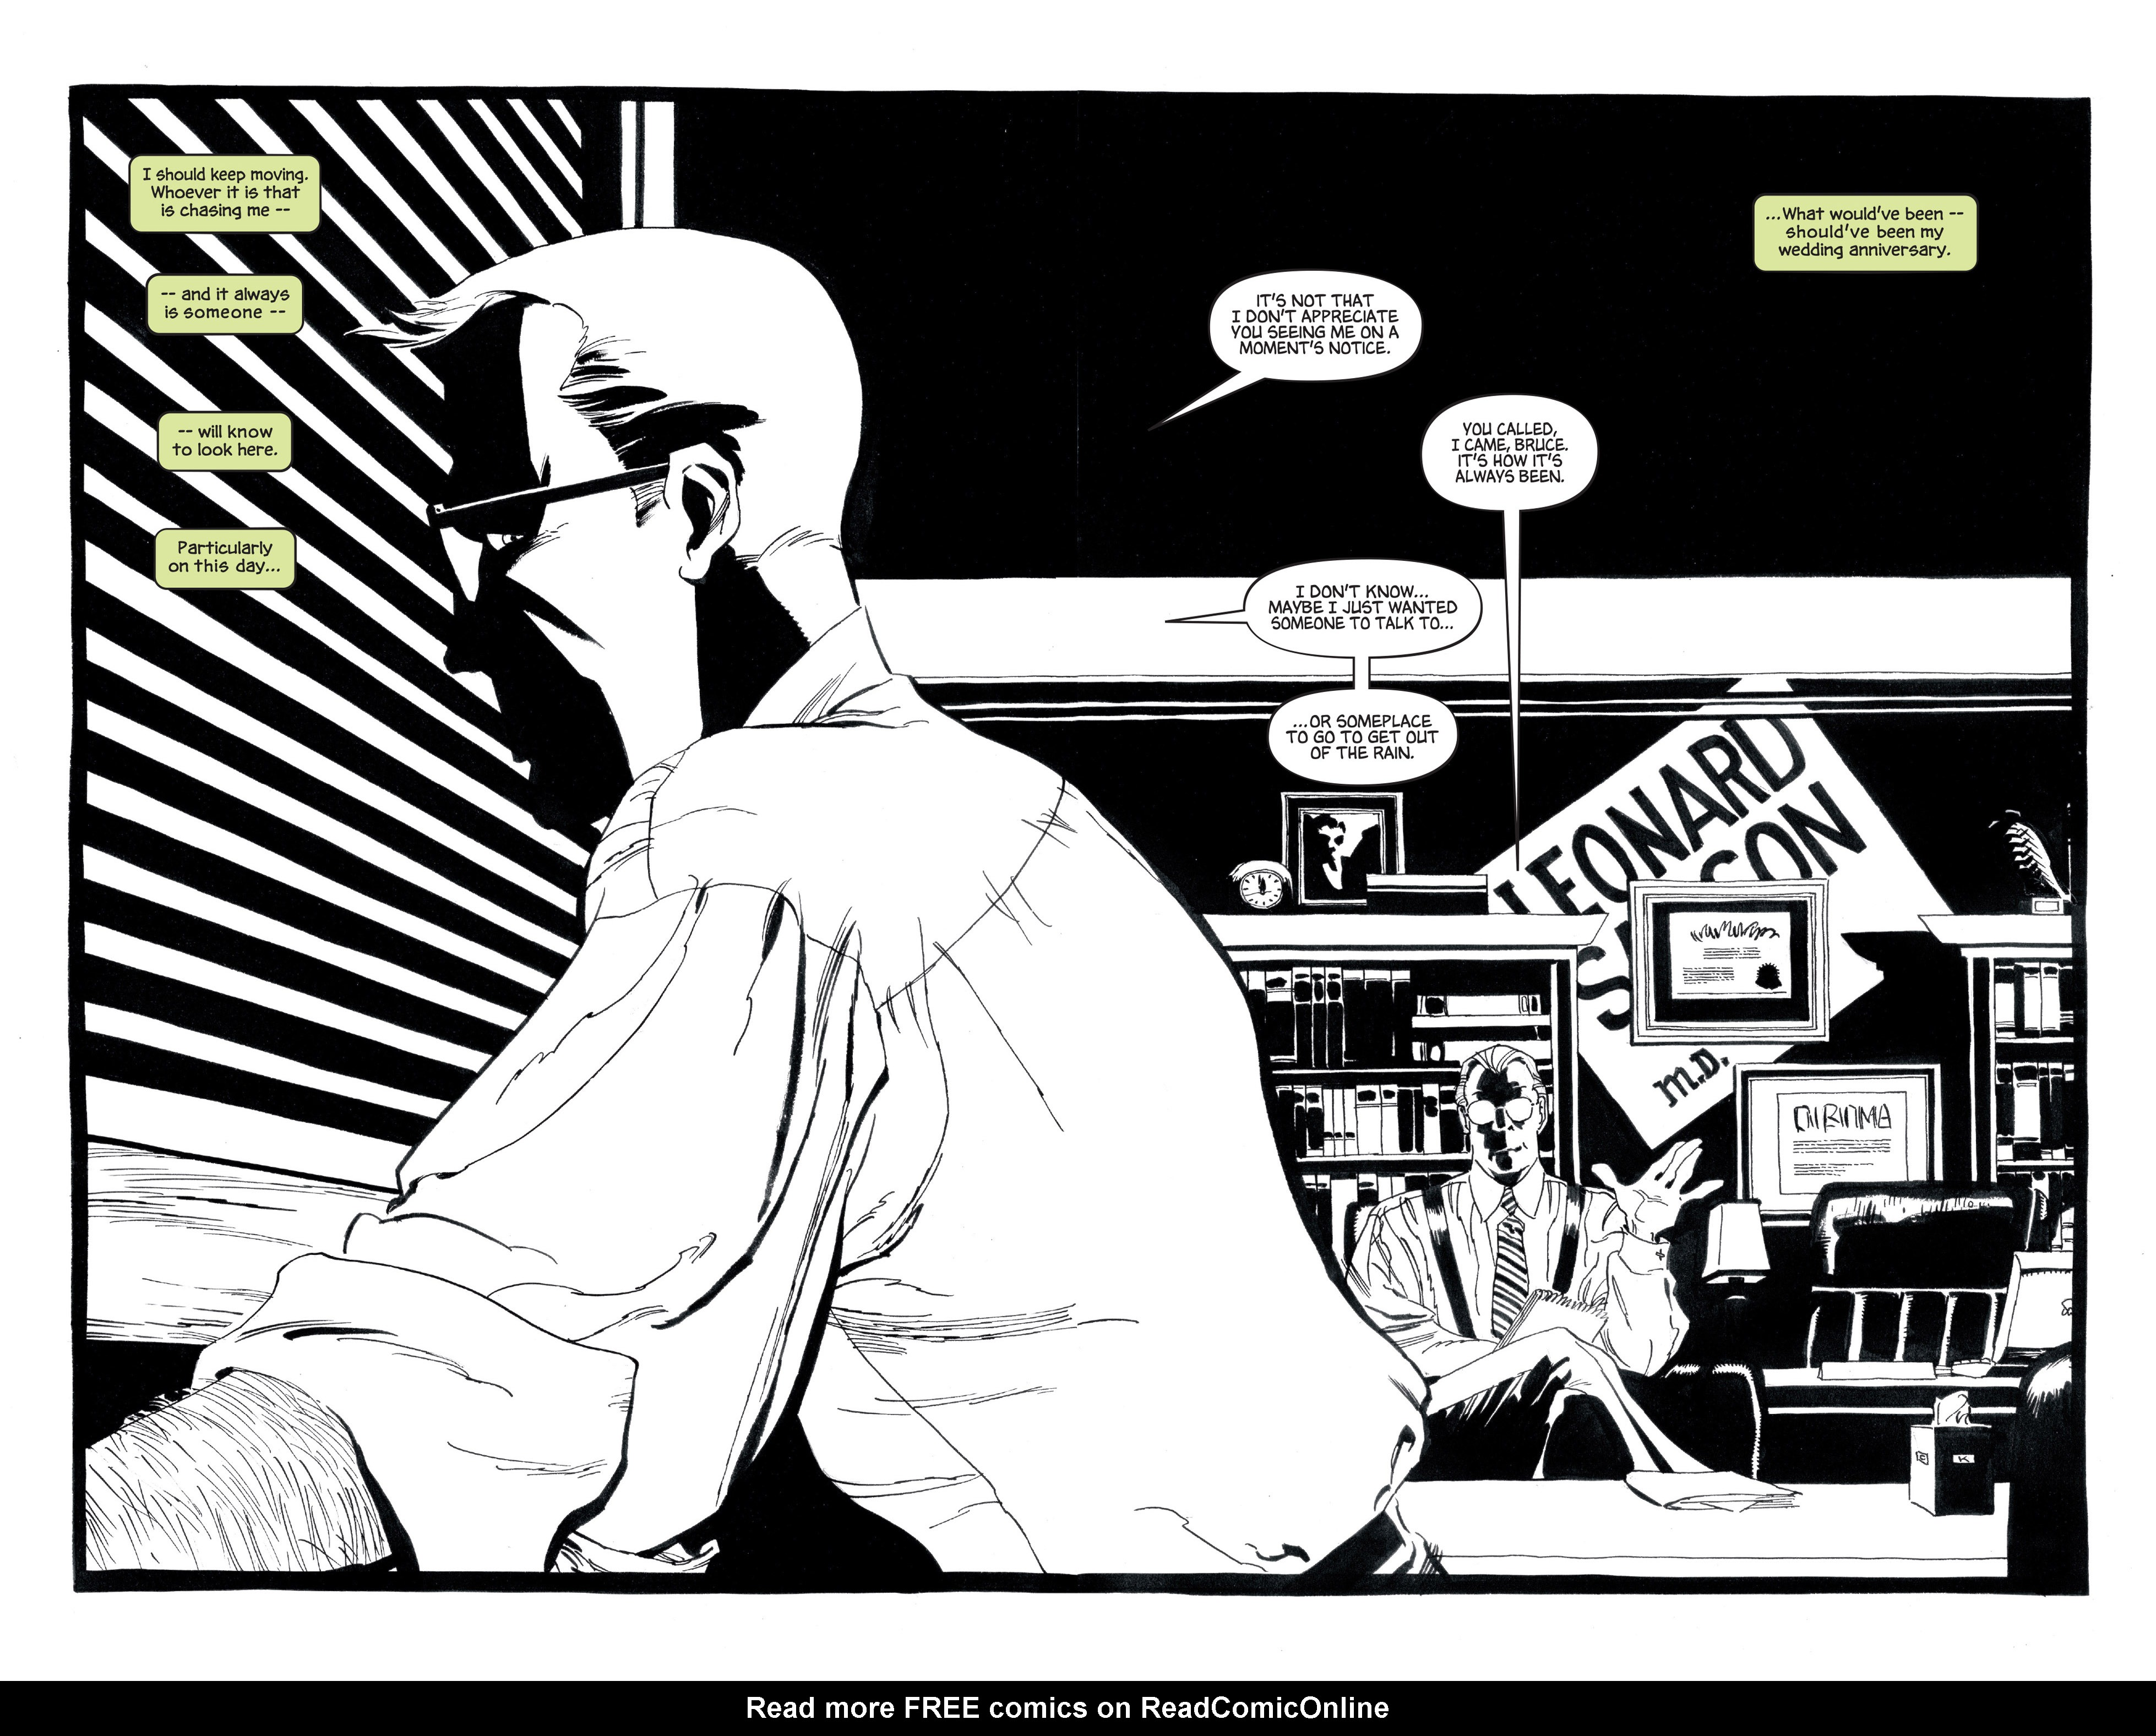 Read online Hulk: Gray comic -  Issue #1 - 4